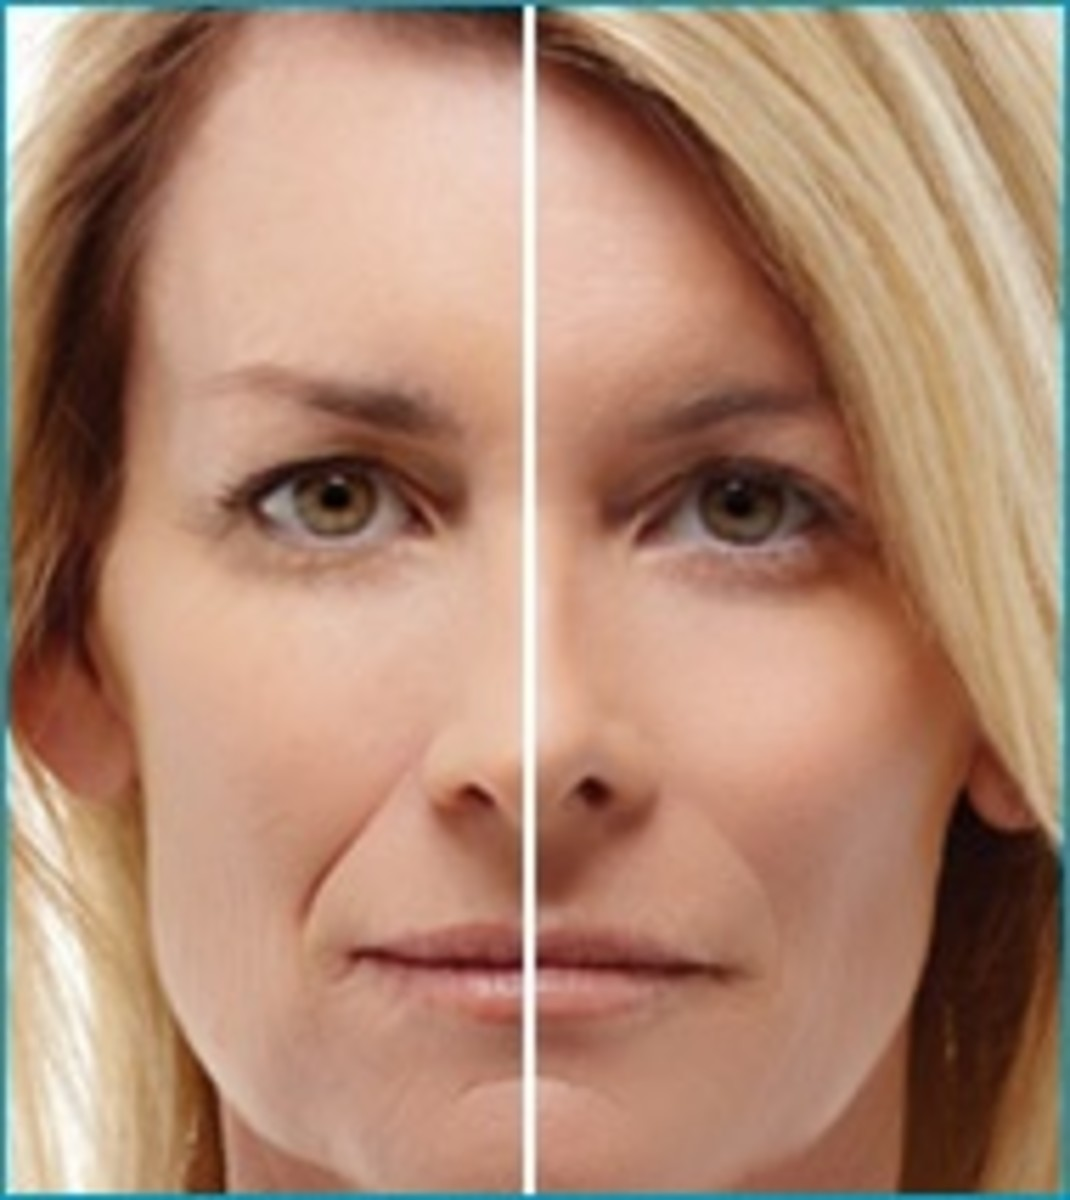 how to get rid of wrinkles between breasts